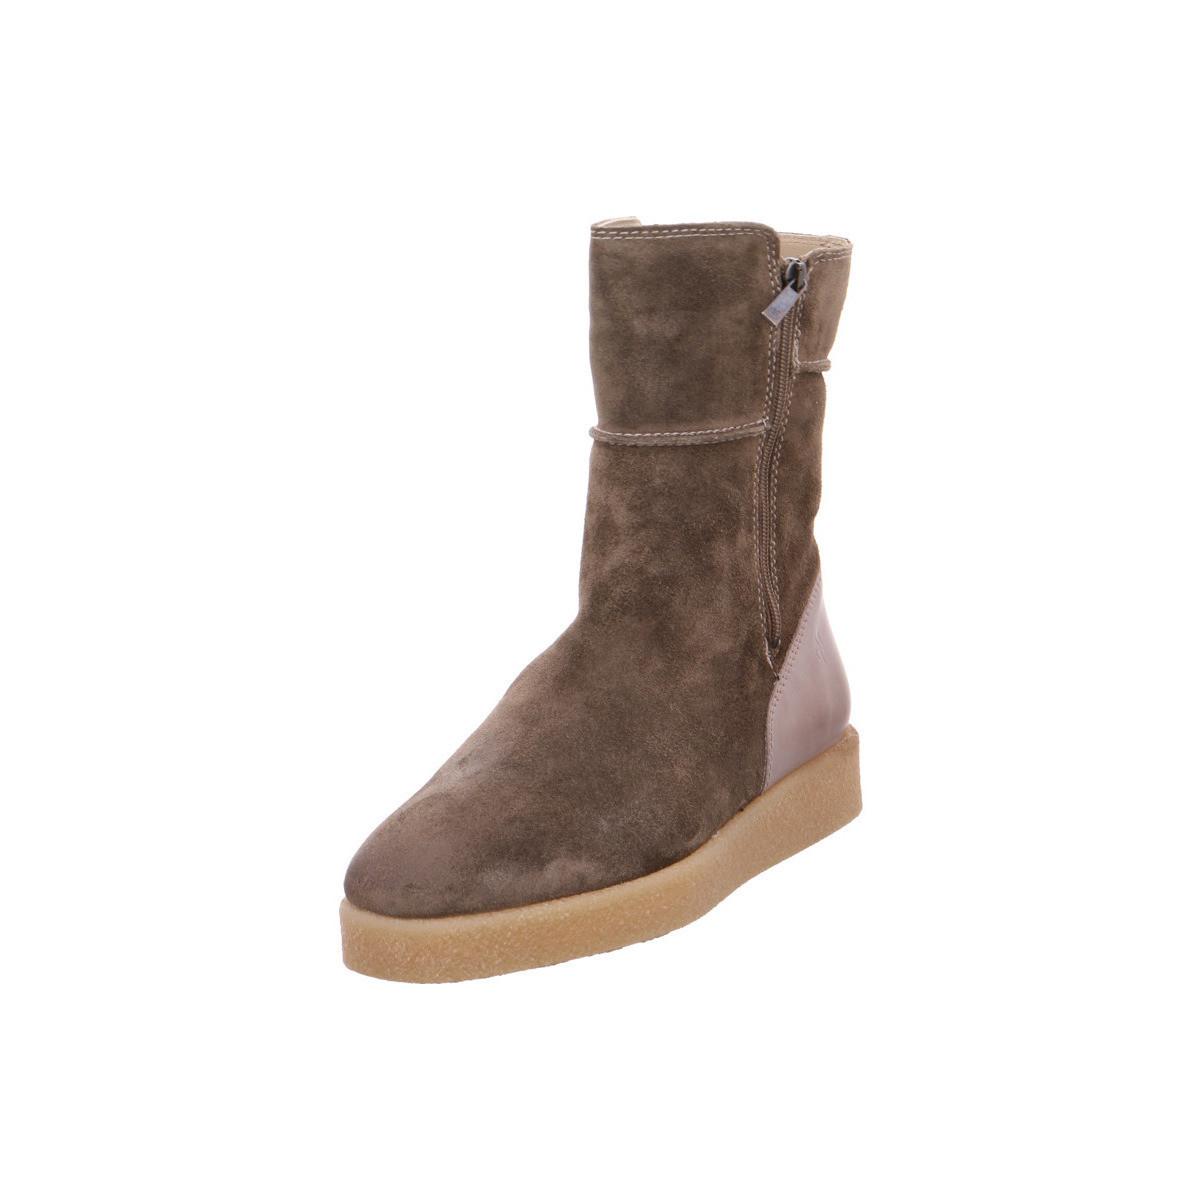 Marc O'Polo - 14296001 beige - Schuhe Boots Damen 127,95 €